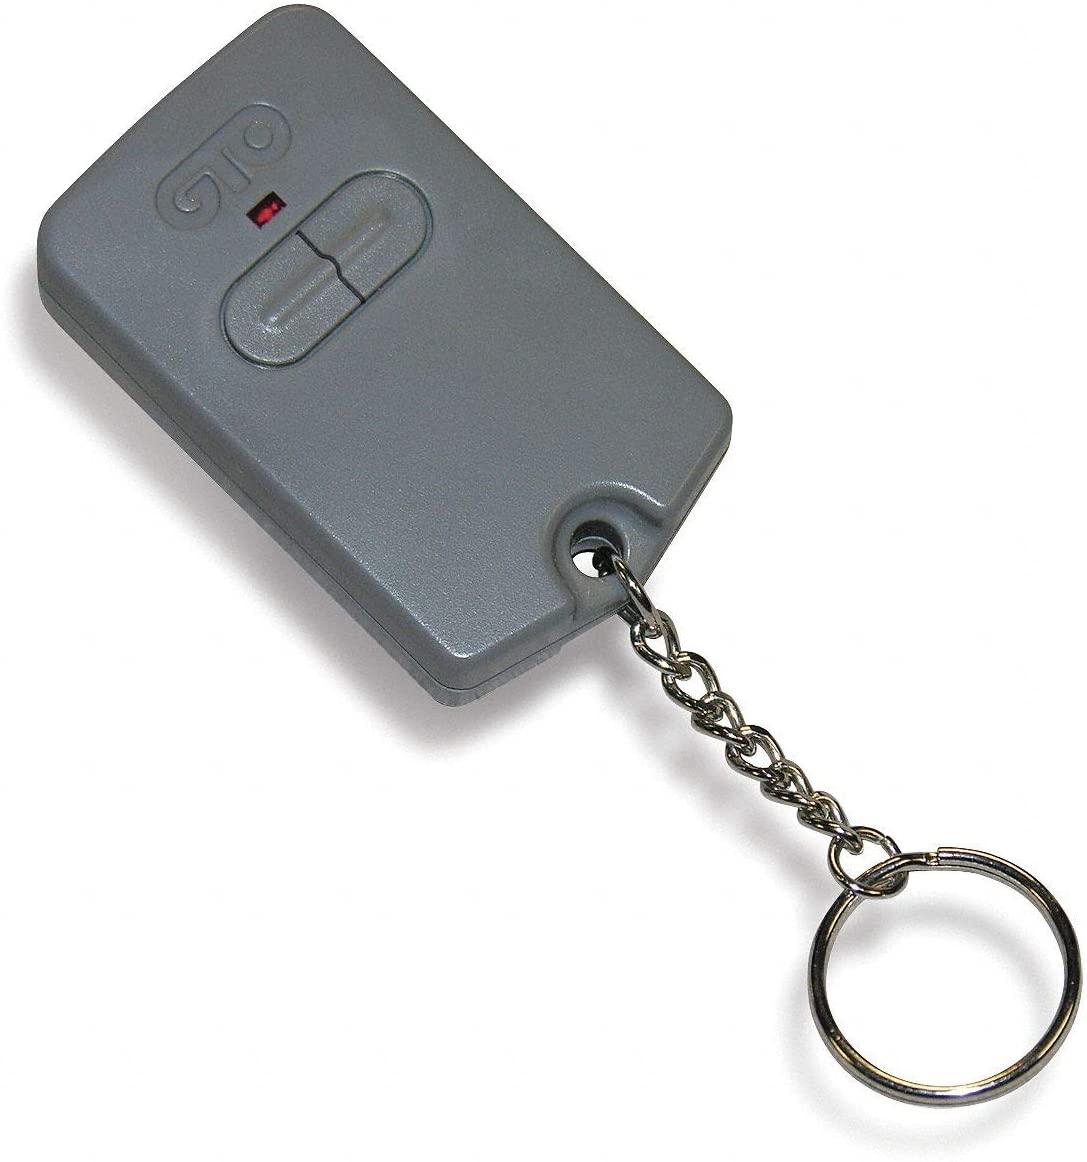 Mighty Mule Wireless or Wired Digital Keypad (FM137) by Mighty Mule